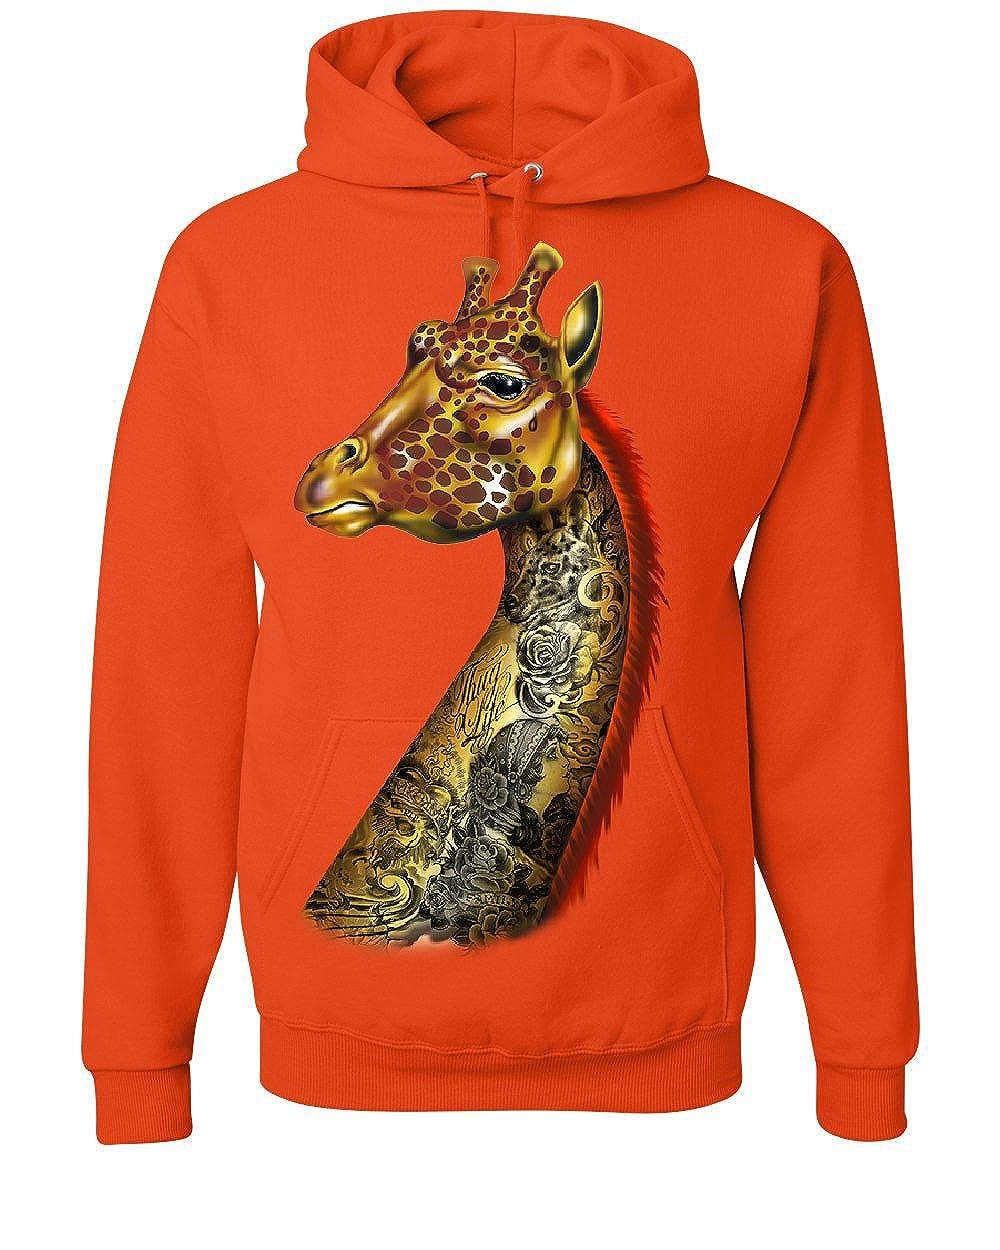 Tee Hunt Tattoed Giraffe Hoodie Giraffe with Tattoes